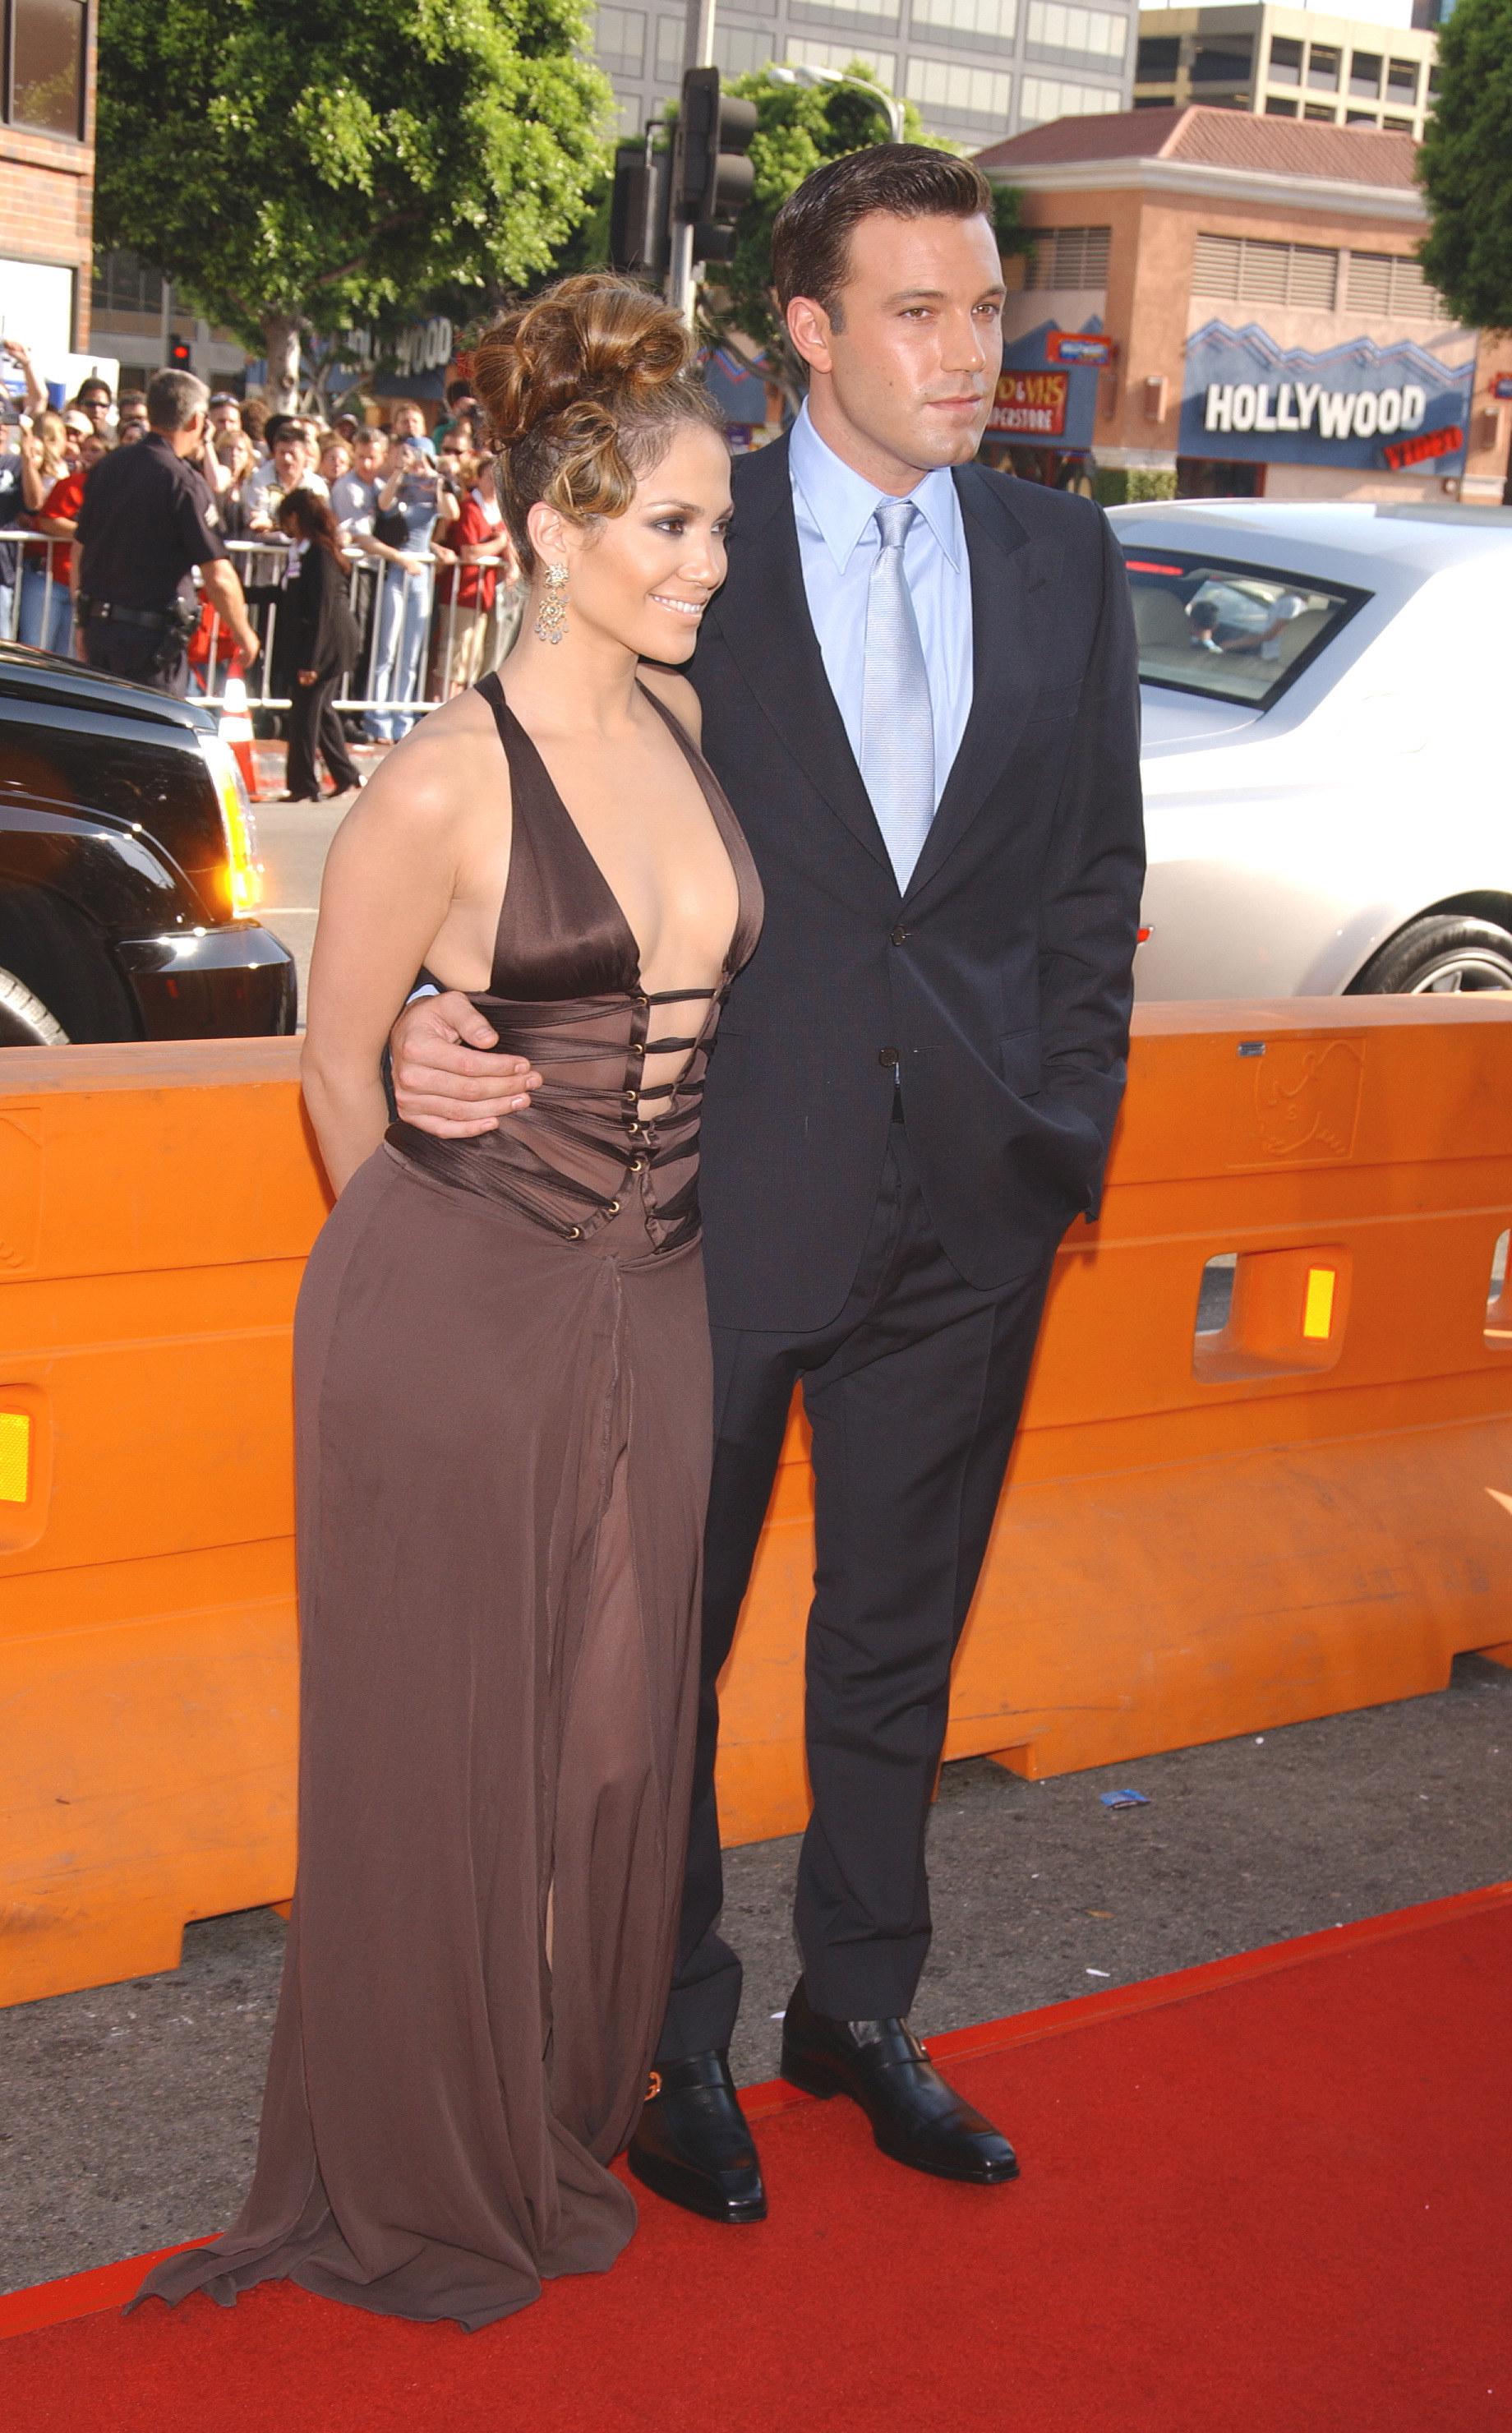 Jennifer Lopez and Ben Affleck at a movie premiere together